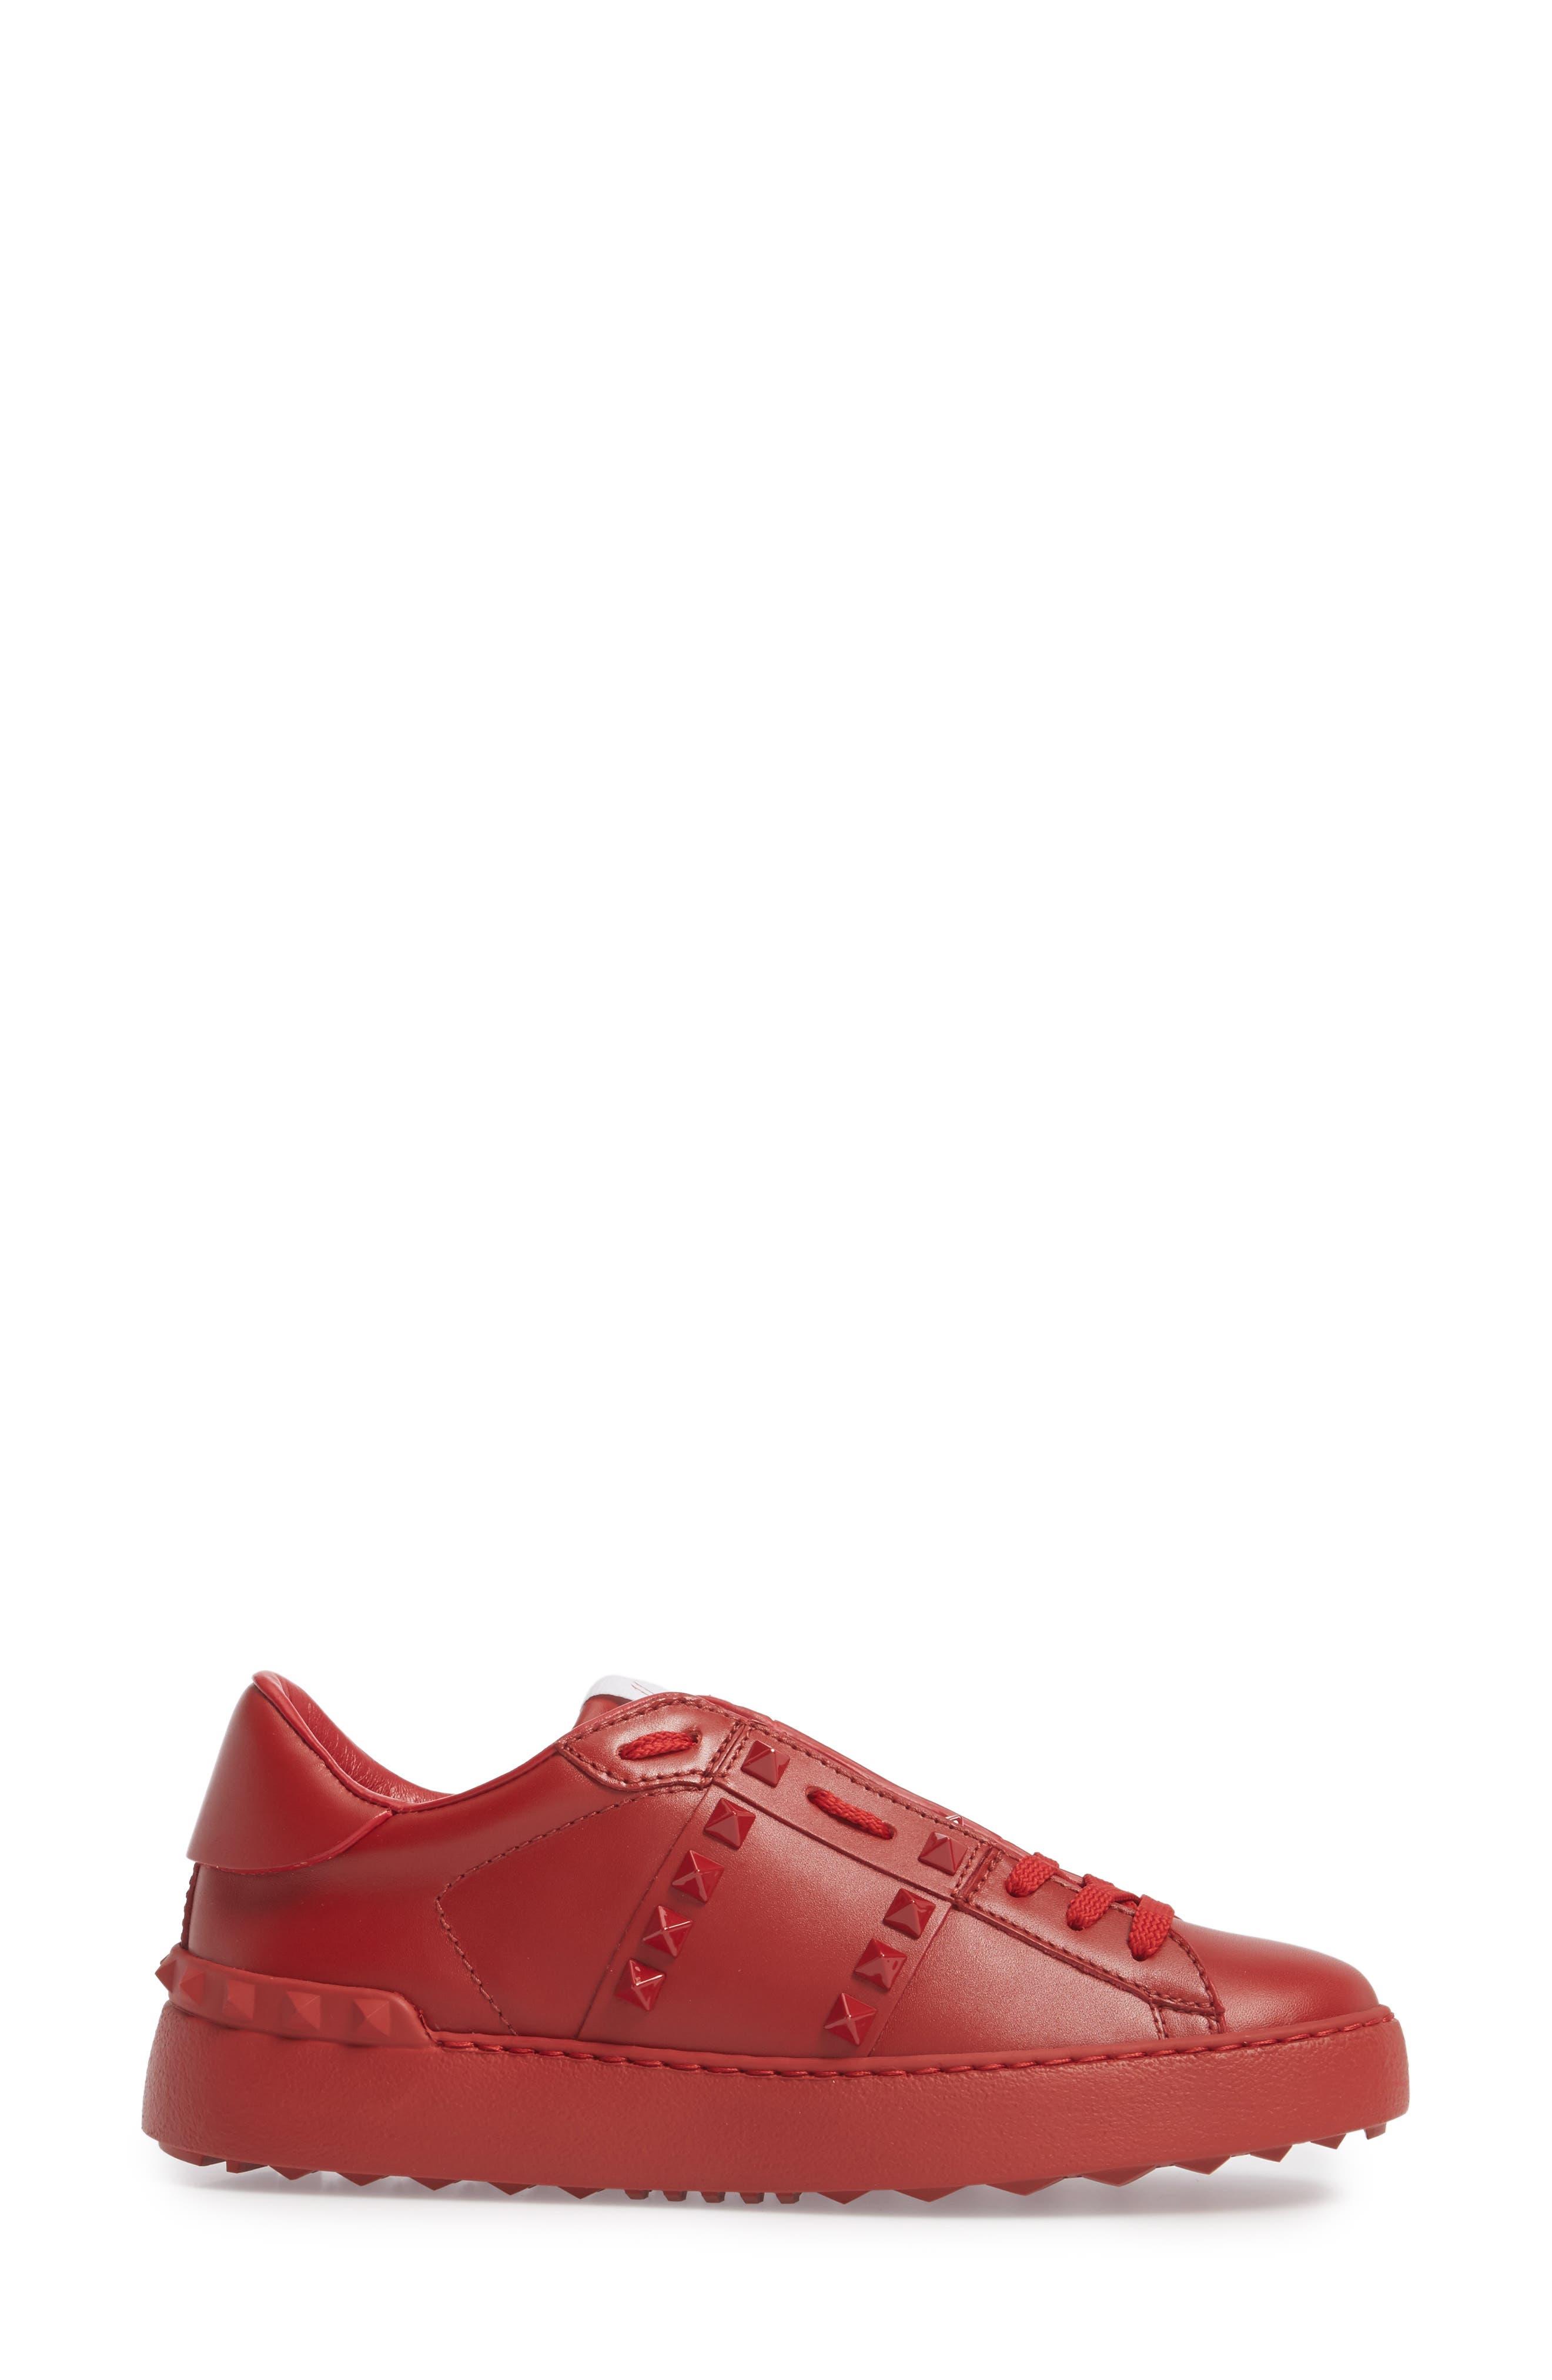 Rockstud Sneaker,                             Alternate thumbnail 3, color,                             Red